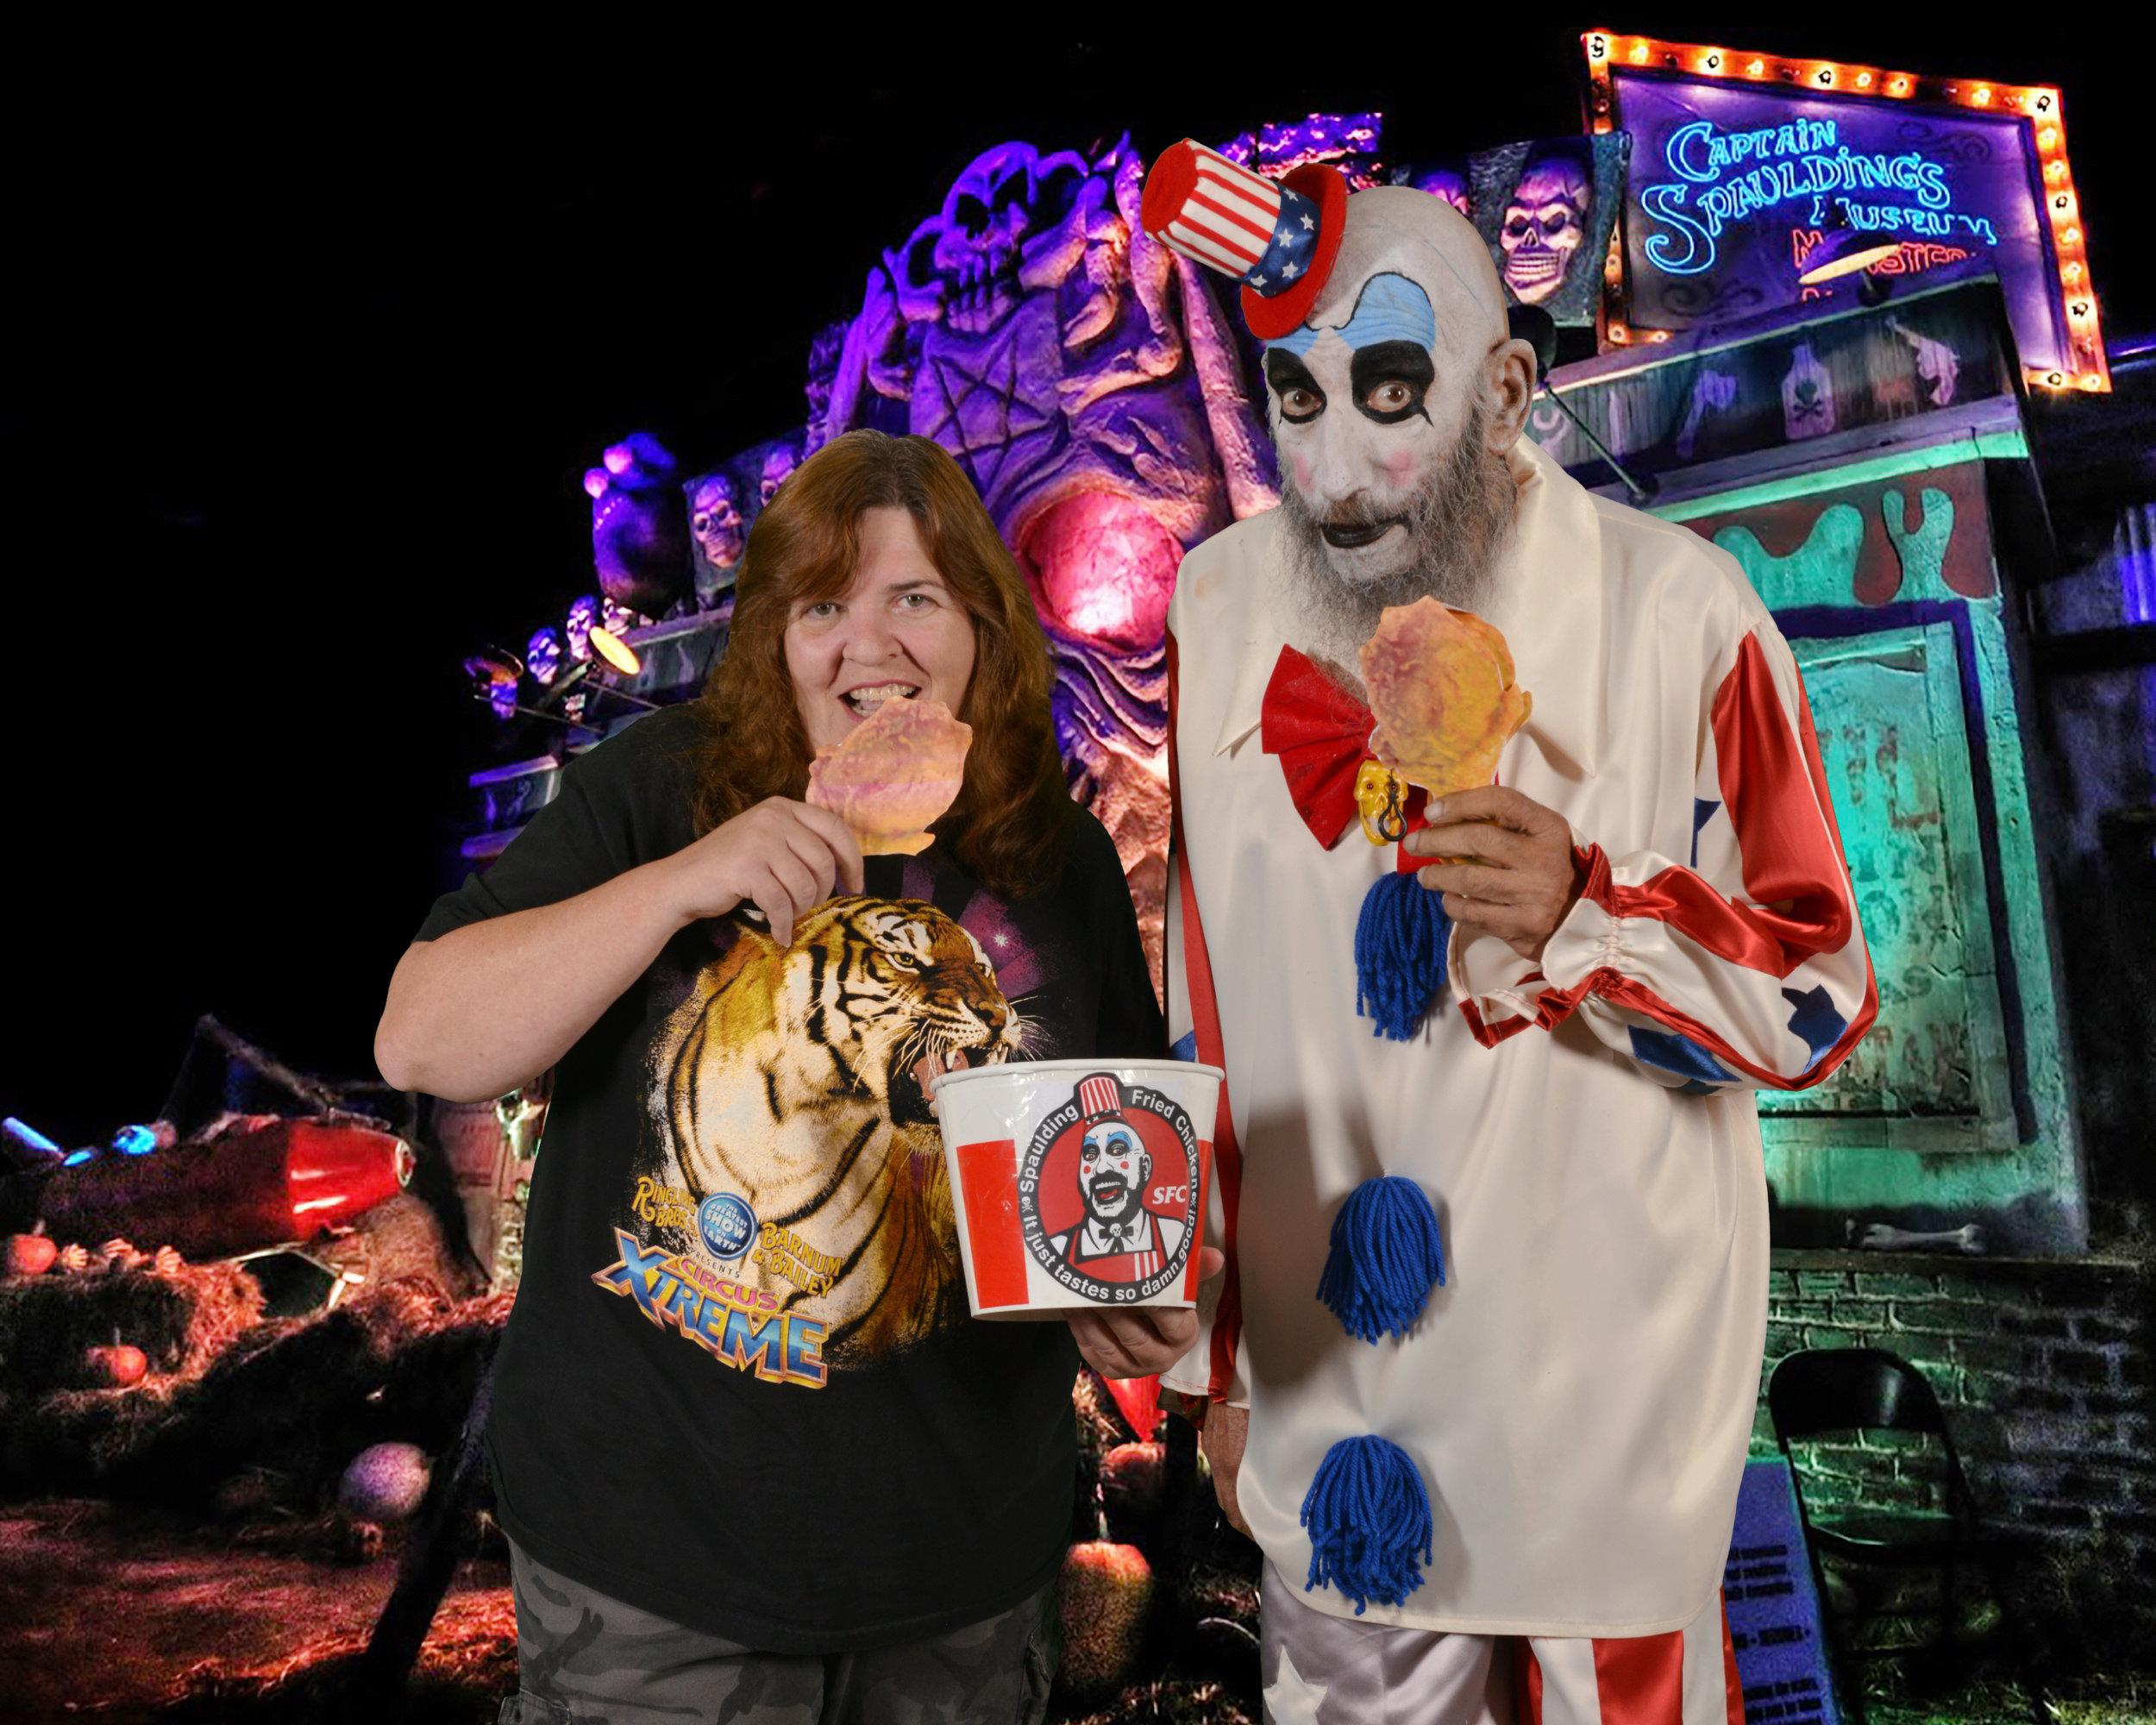 Celebrity-photo-ops-evil-clown